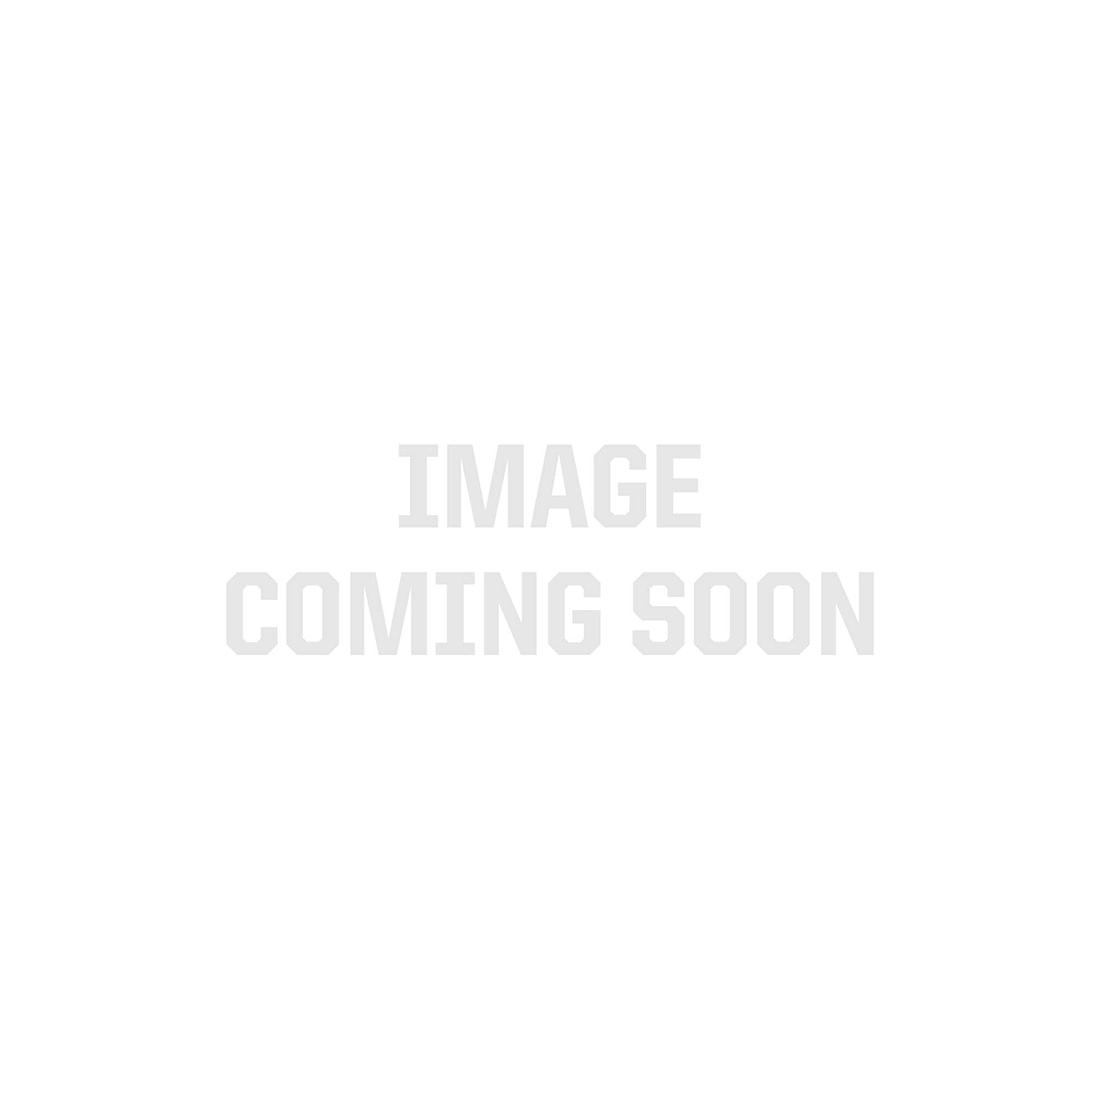 TruColor 2835 LED Strip Light - 4,000K - 80/m - CurrentControl - Sample Kit